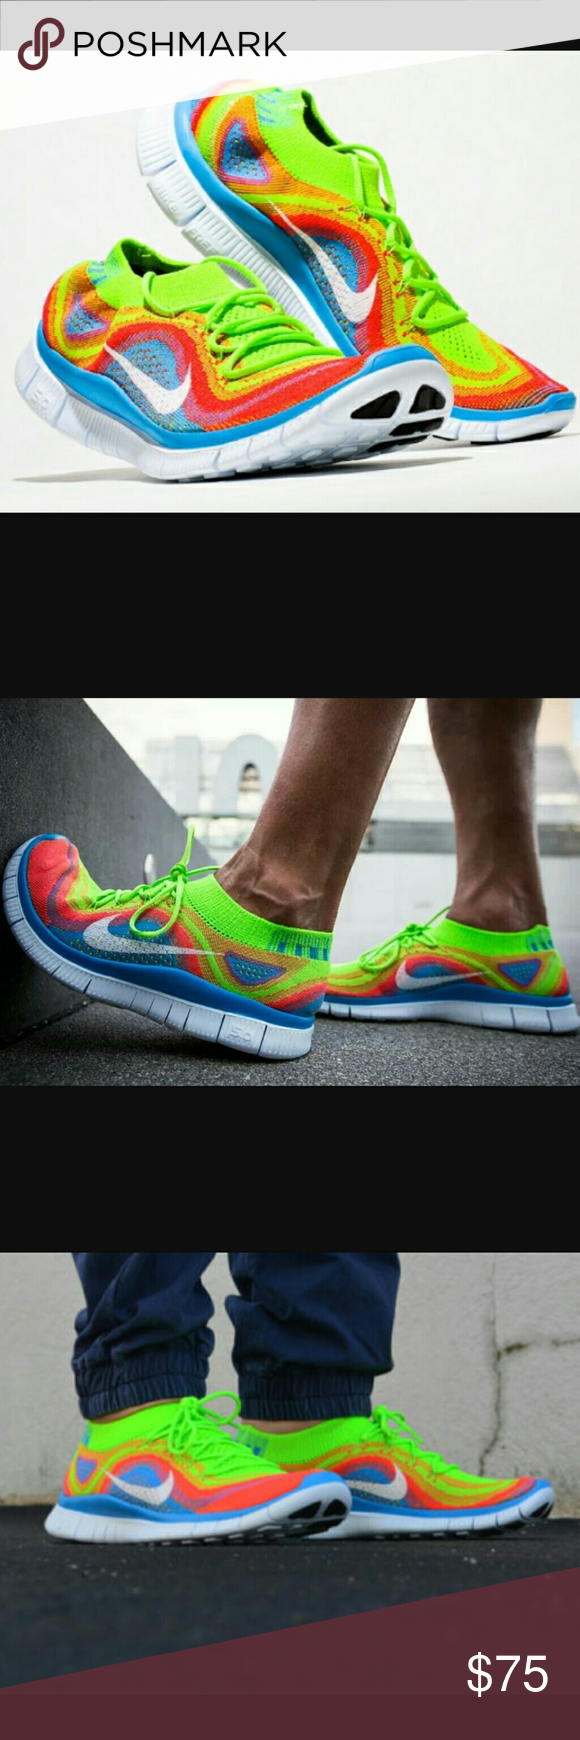 Nike free knit 5.0